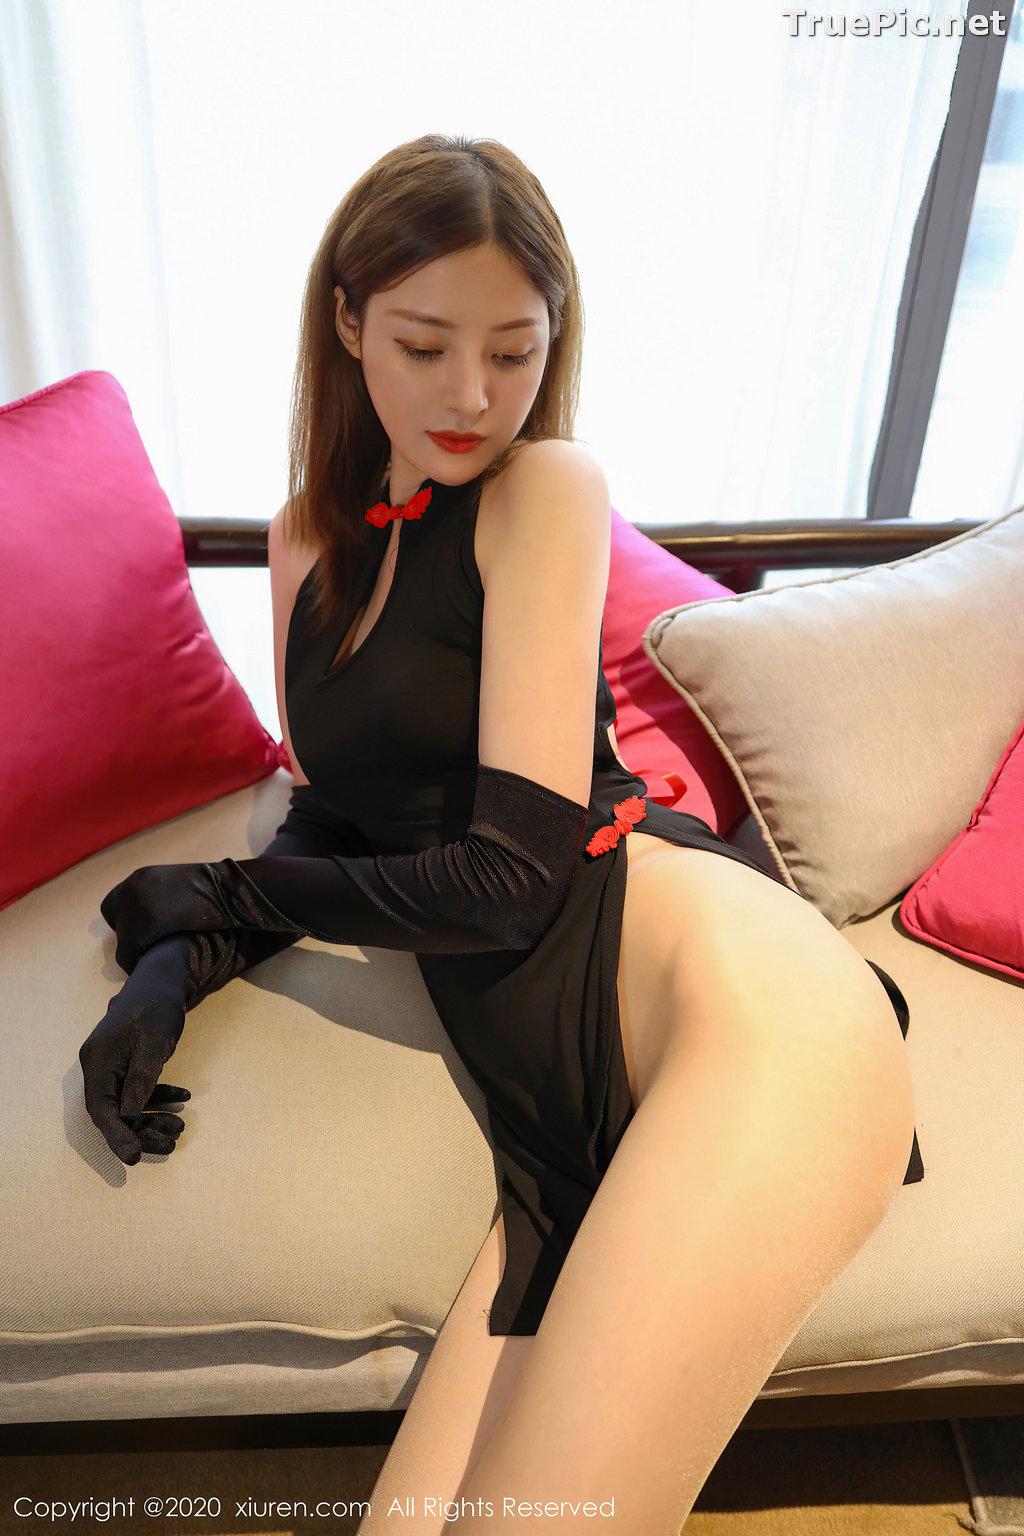 Image XIUREN No.2476 - Chinese Model - 樱花Elsa - Sexy Chinese Dress - TruePic.net - Picture-2